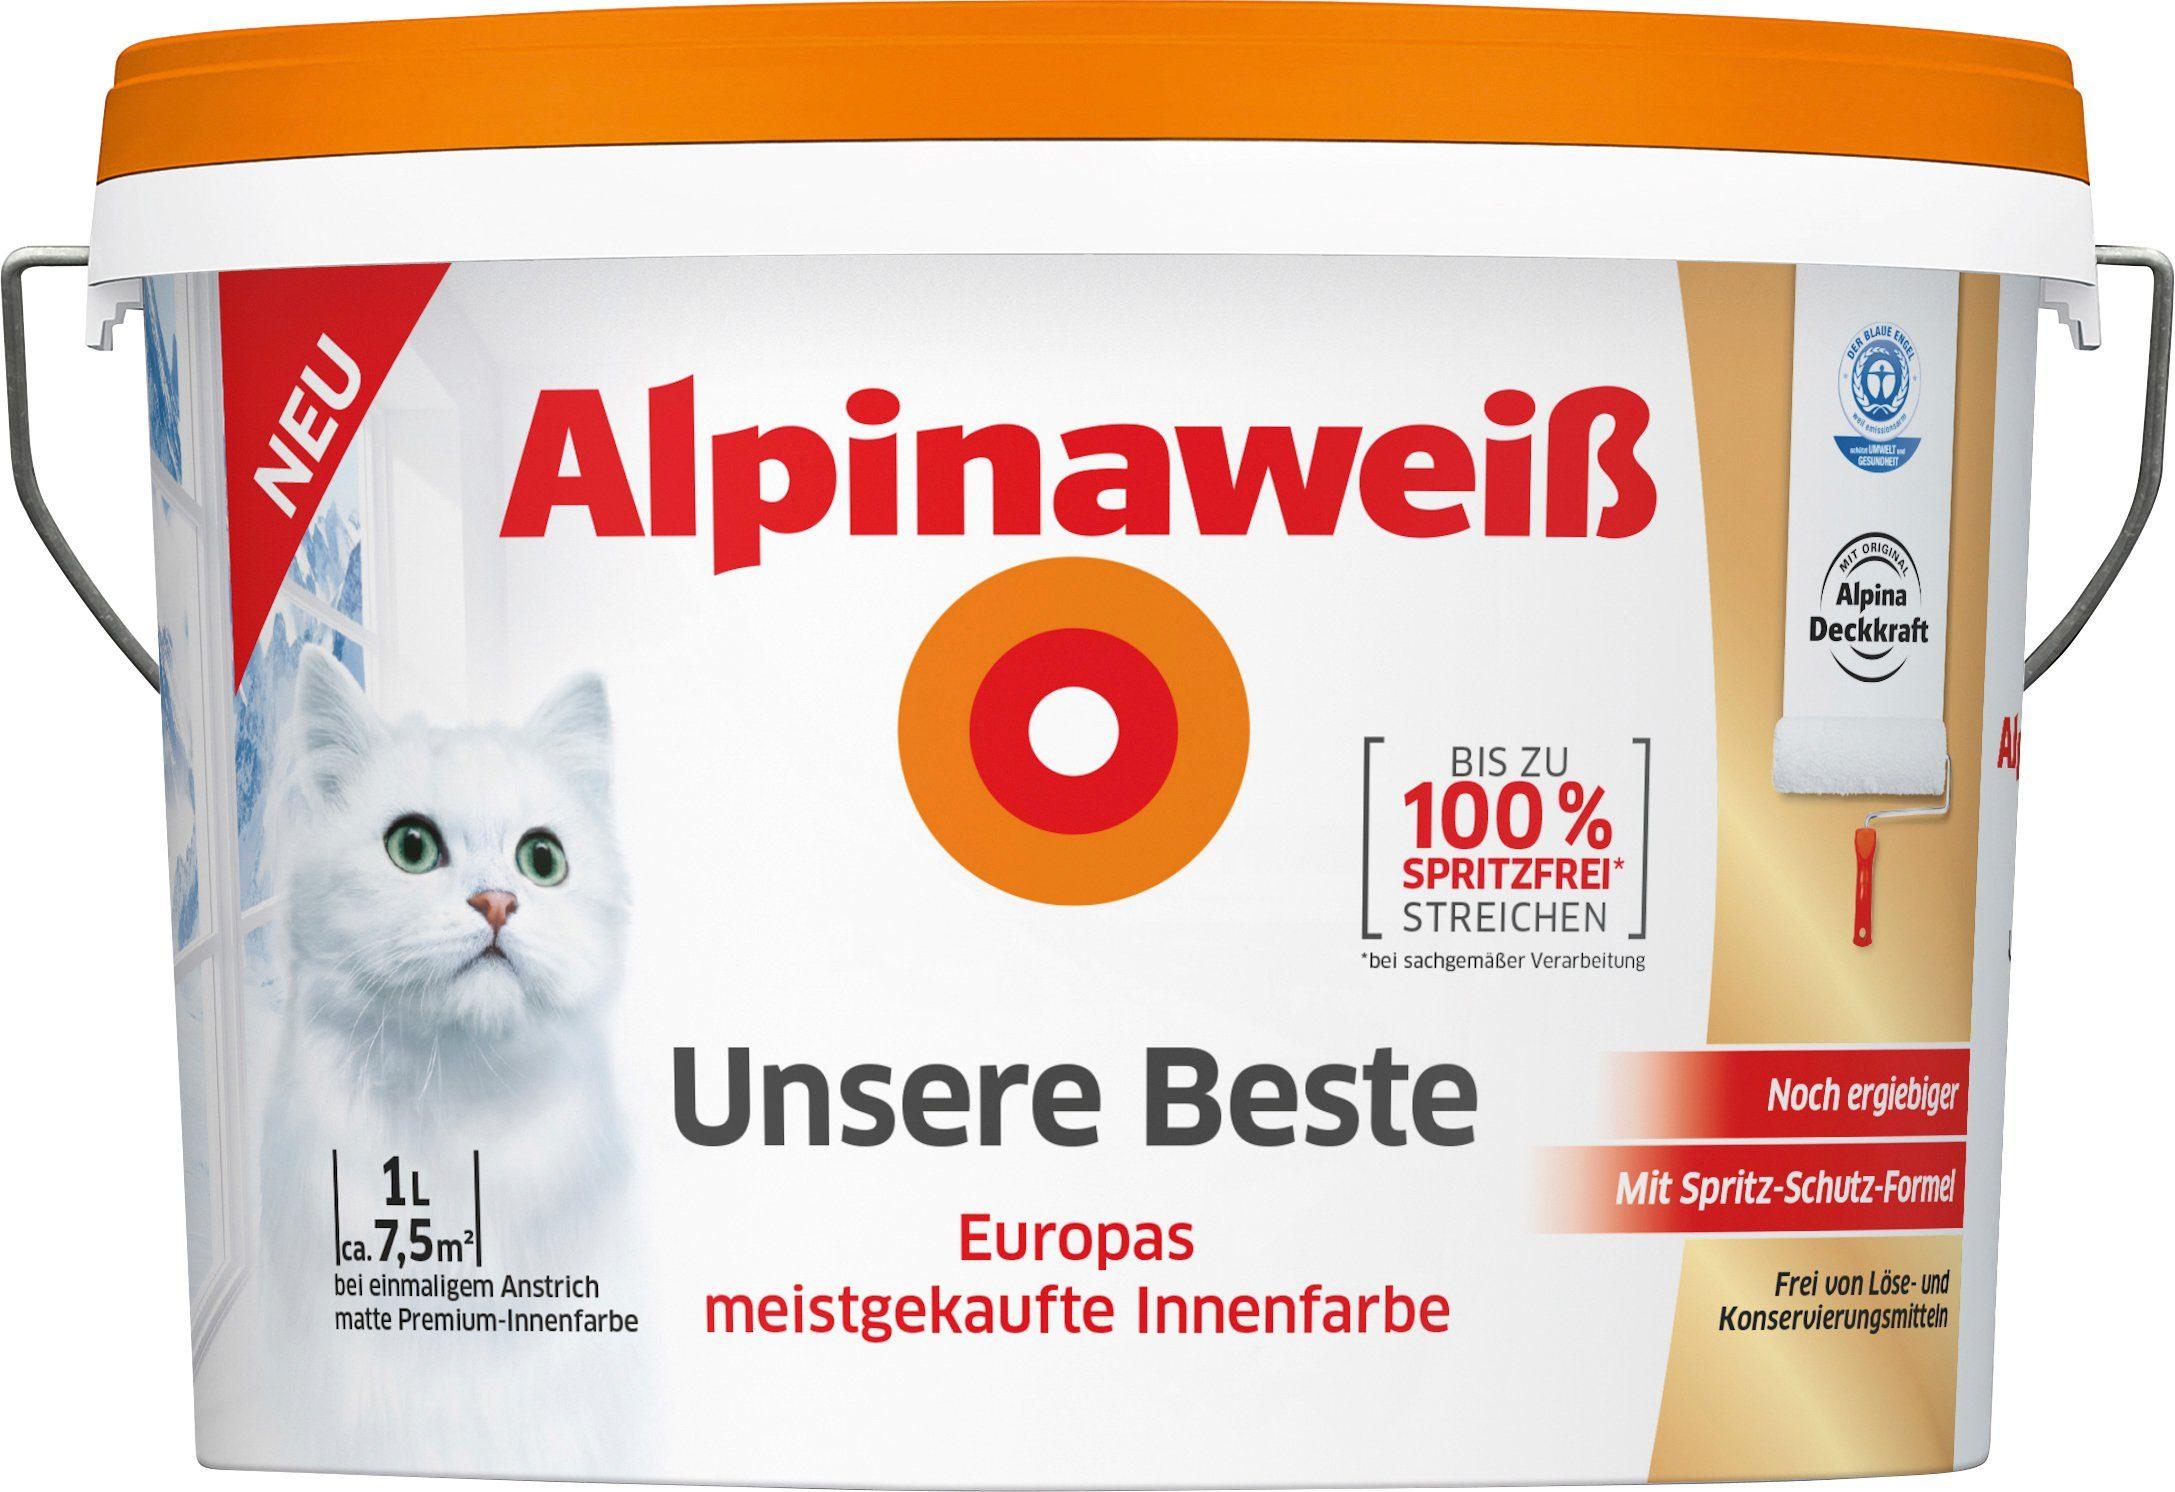 ALPINA Innenfarbe »Unsere Beste«, Alpinaweiß 1 l